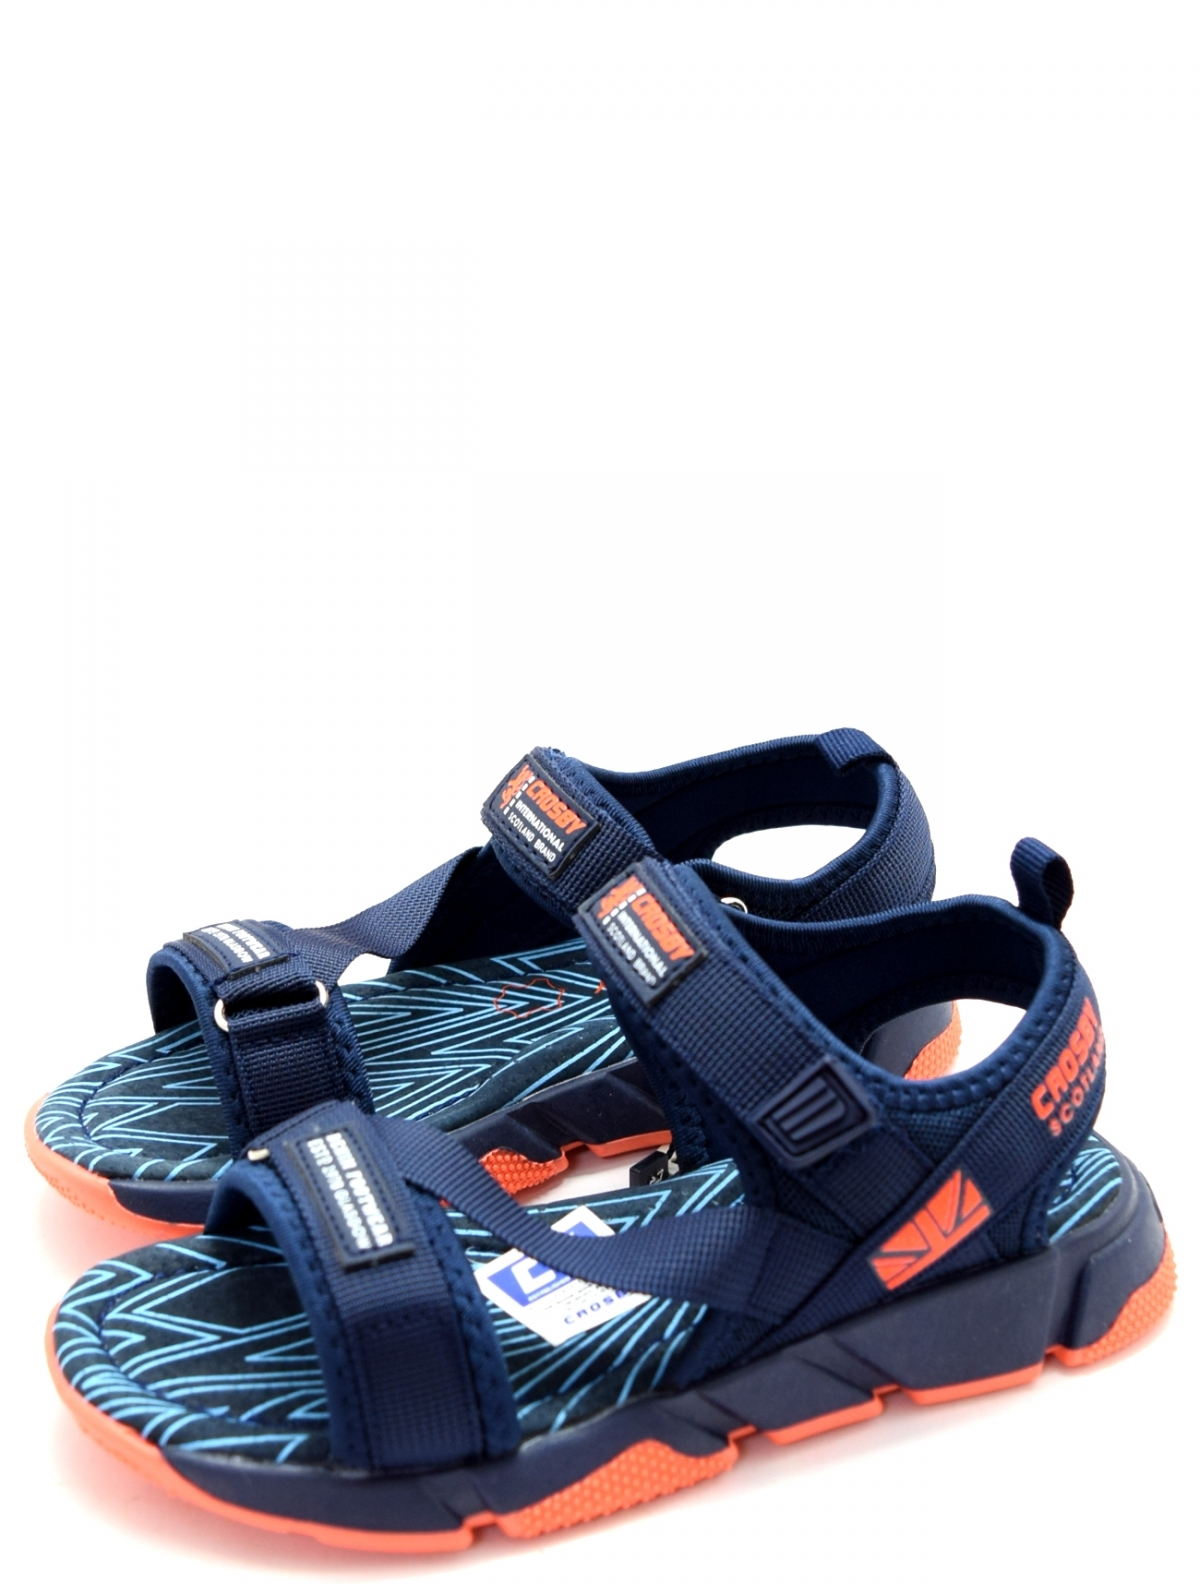 CROSBY 207237/01-03 сандали для мальчика